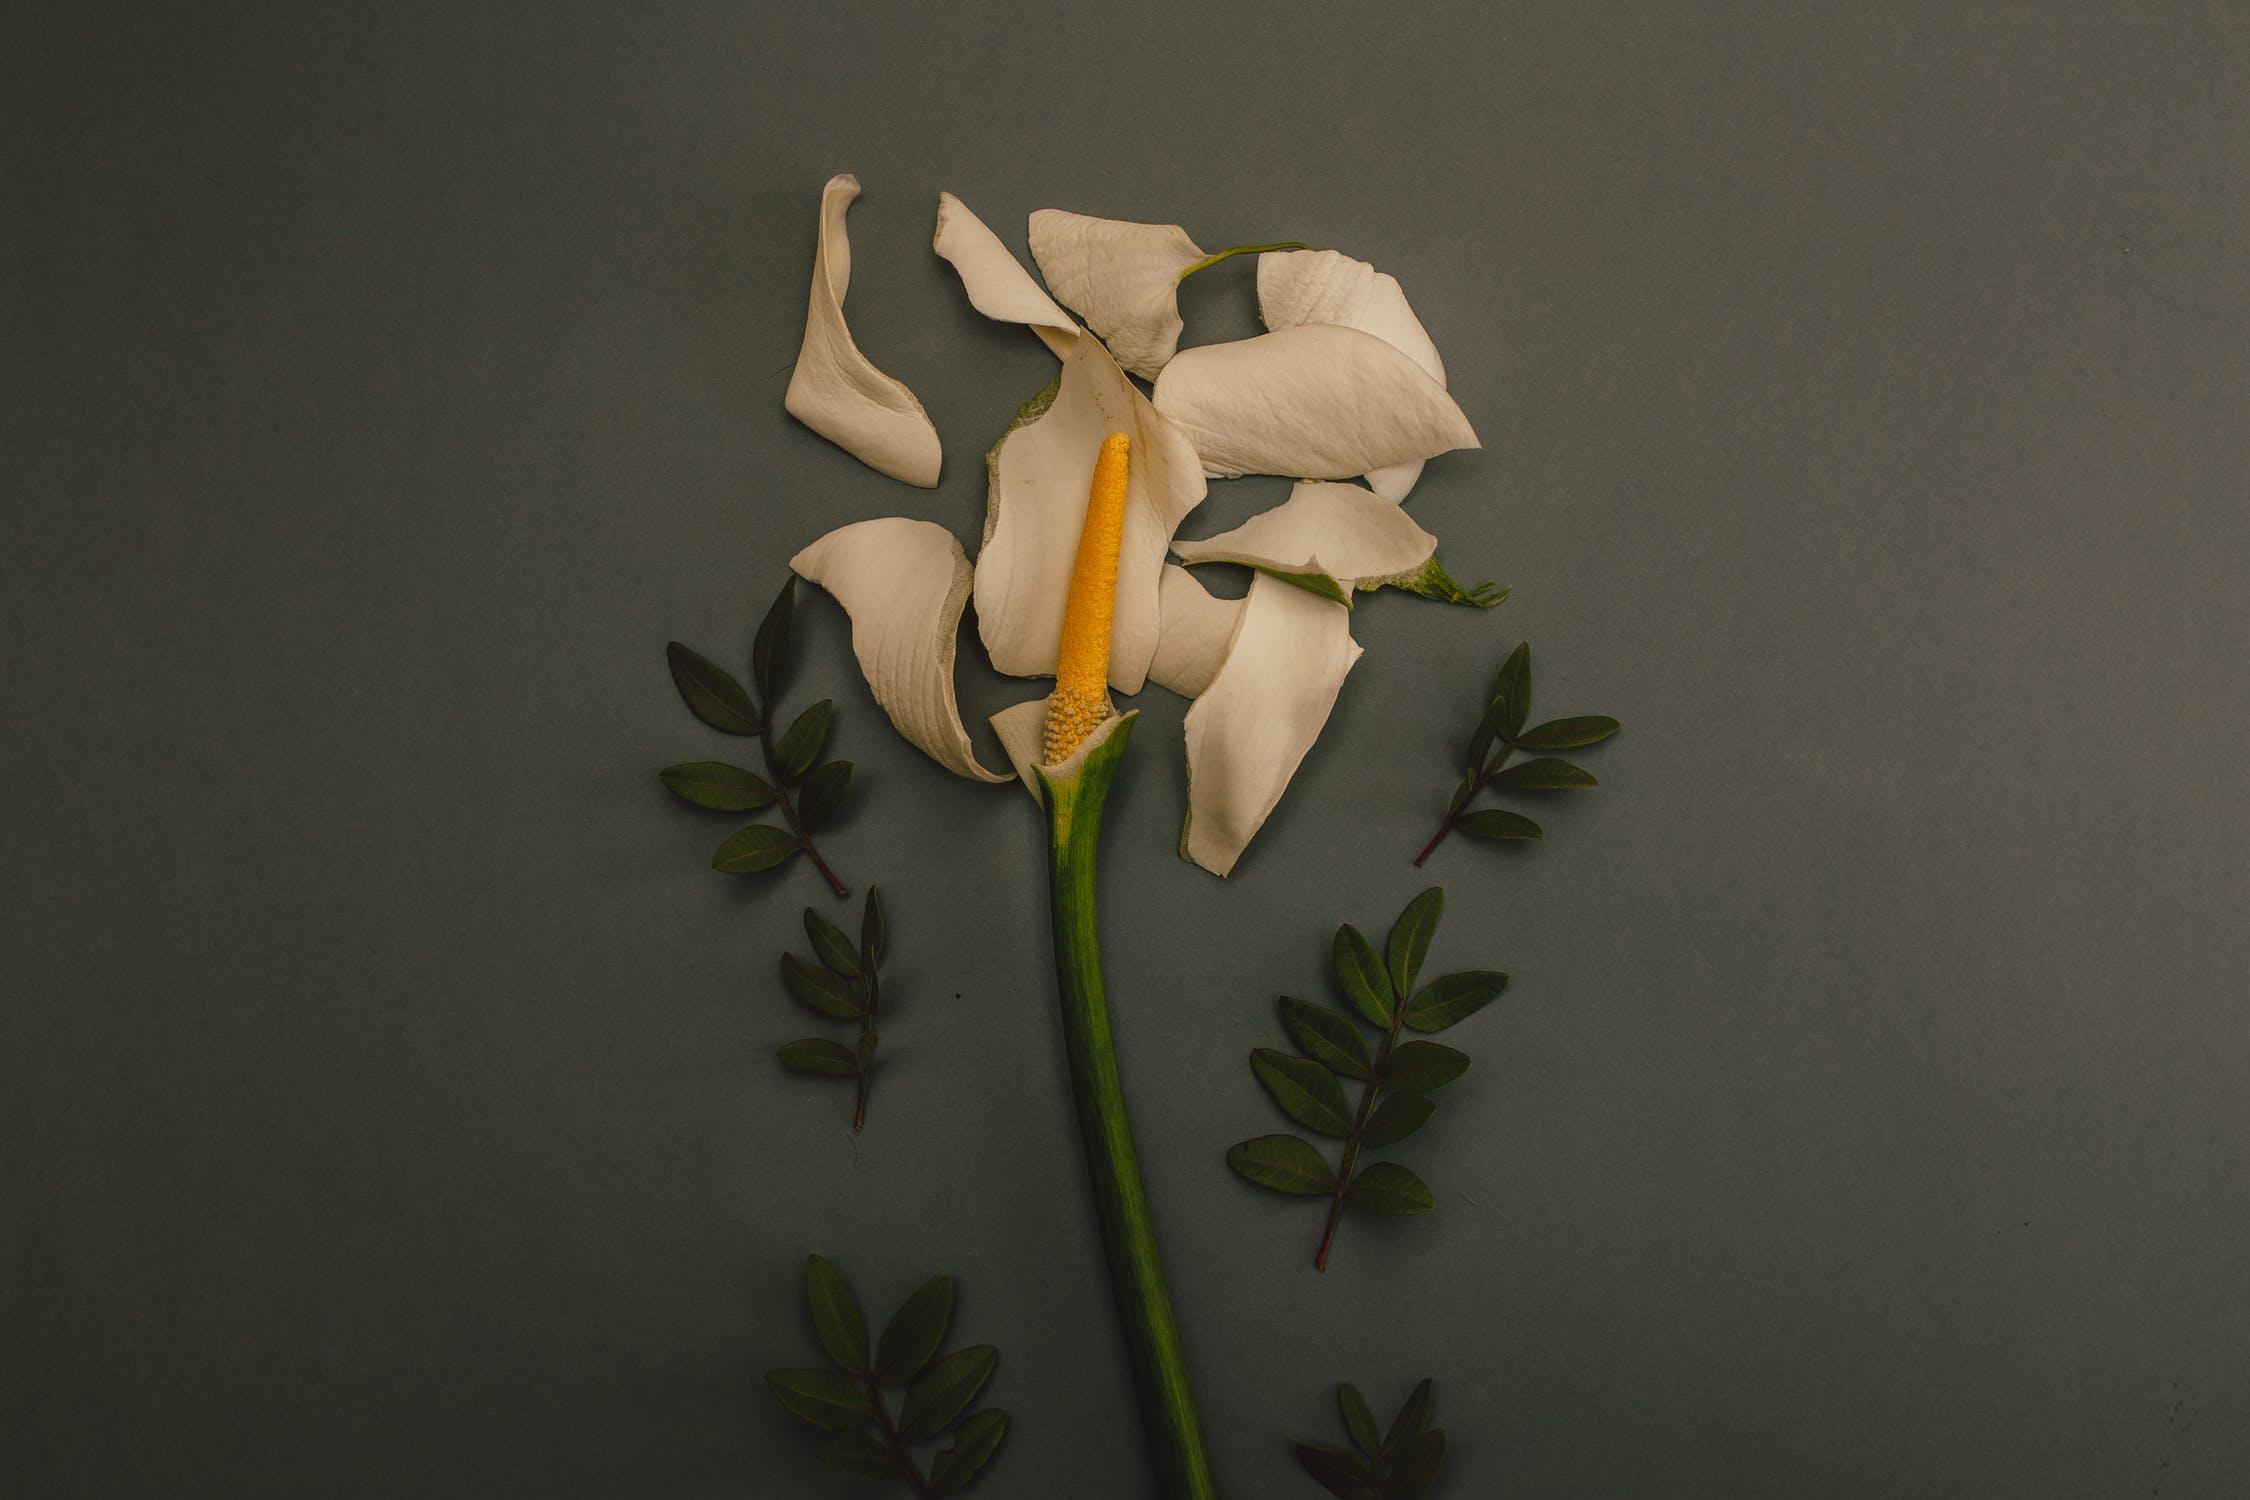 destroyed flower